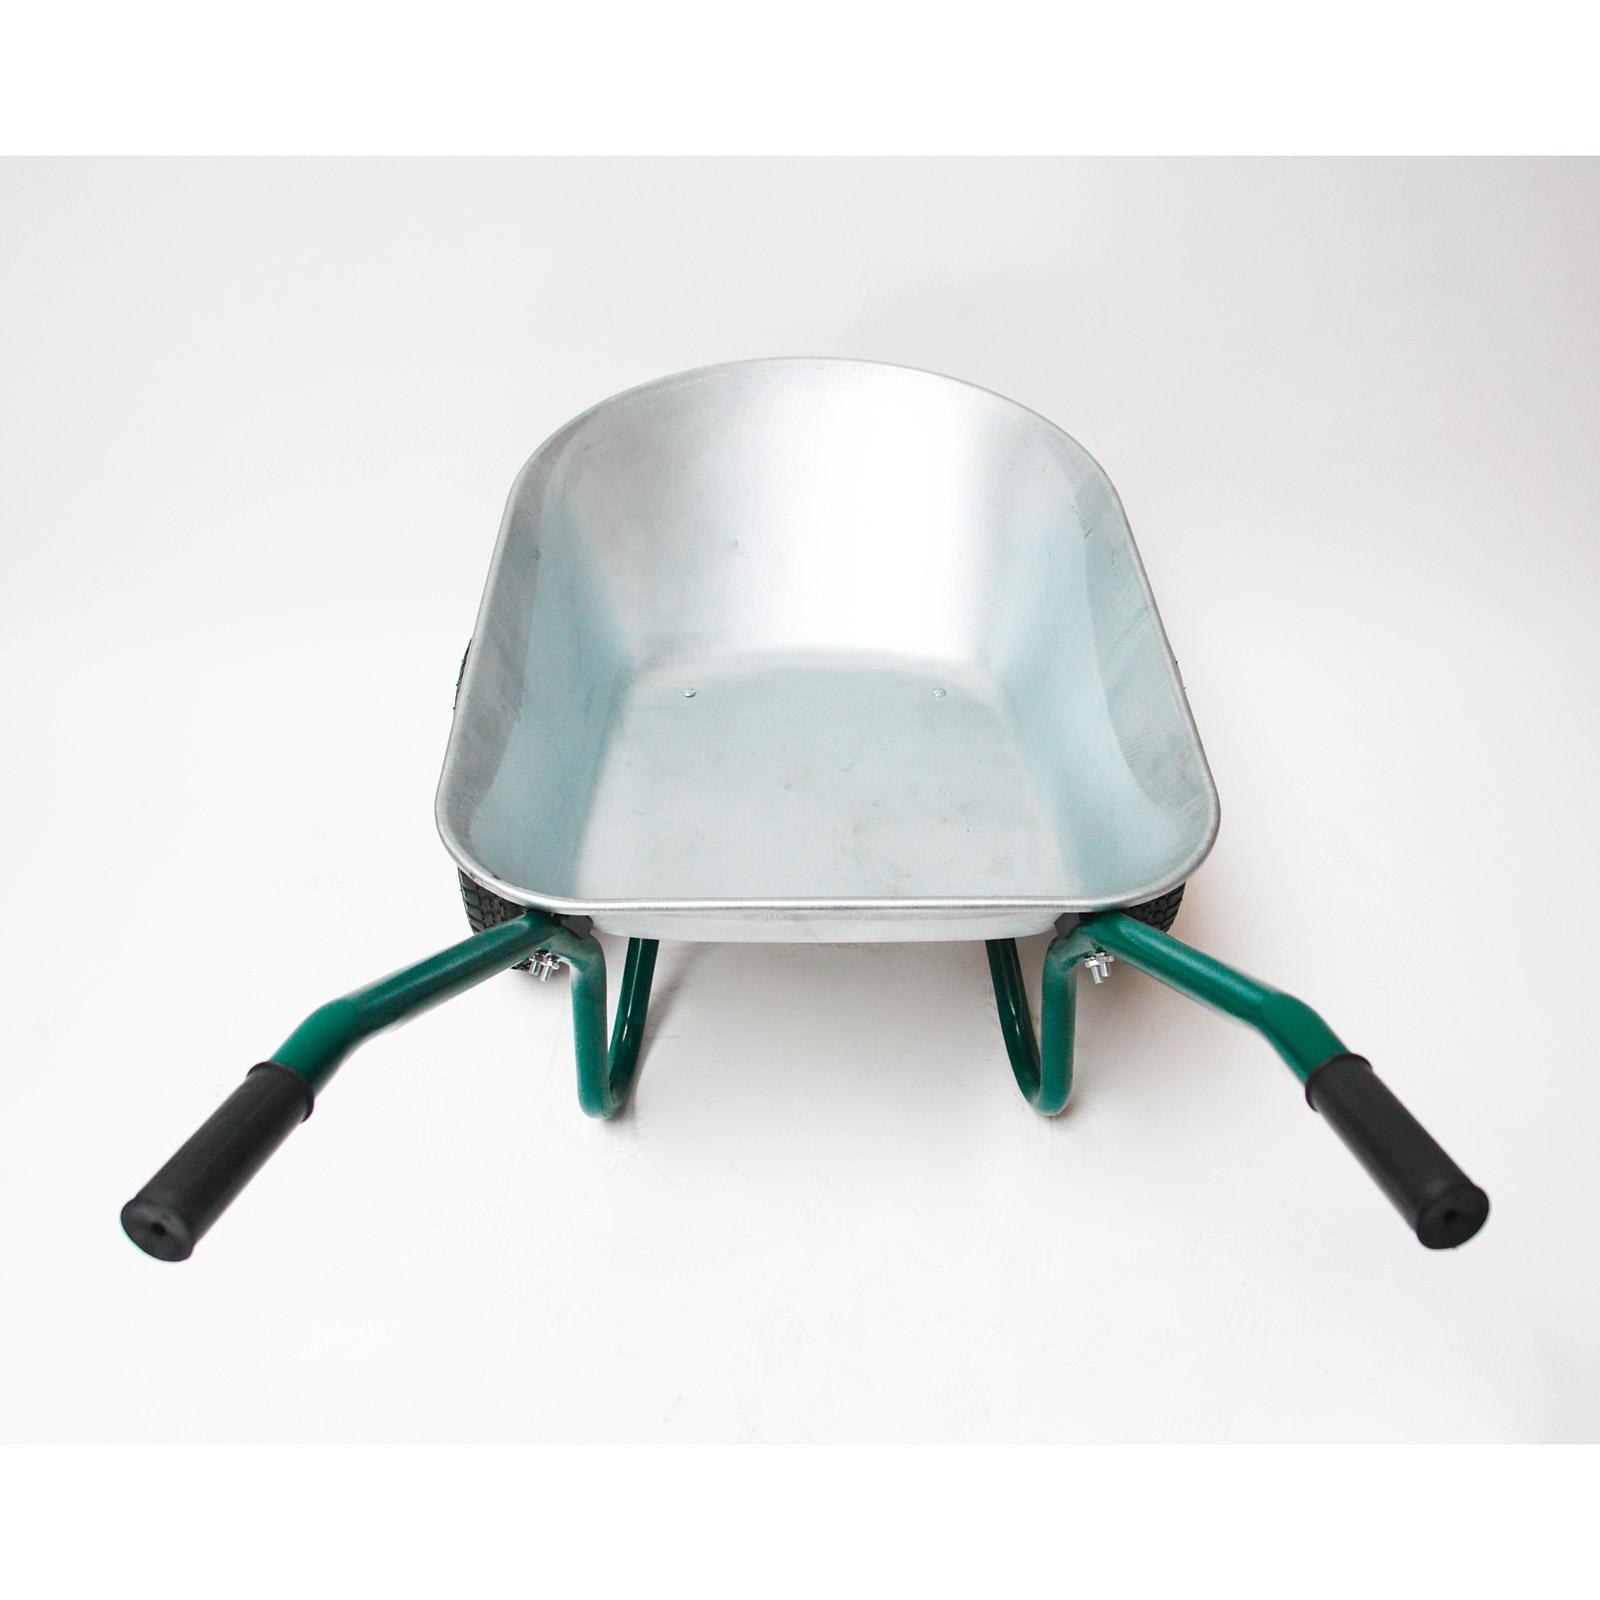 metall schubkarre mit 2 r der 80l aktionspreis neu. Black Bedroom Furniture Sets. Home Design Ideas